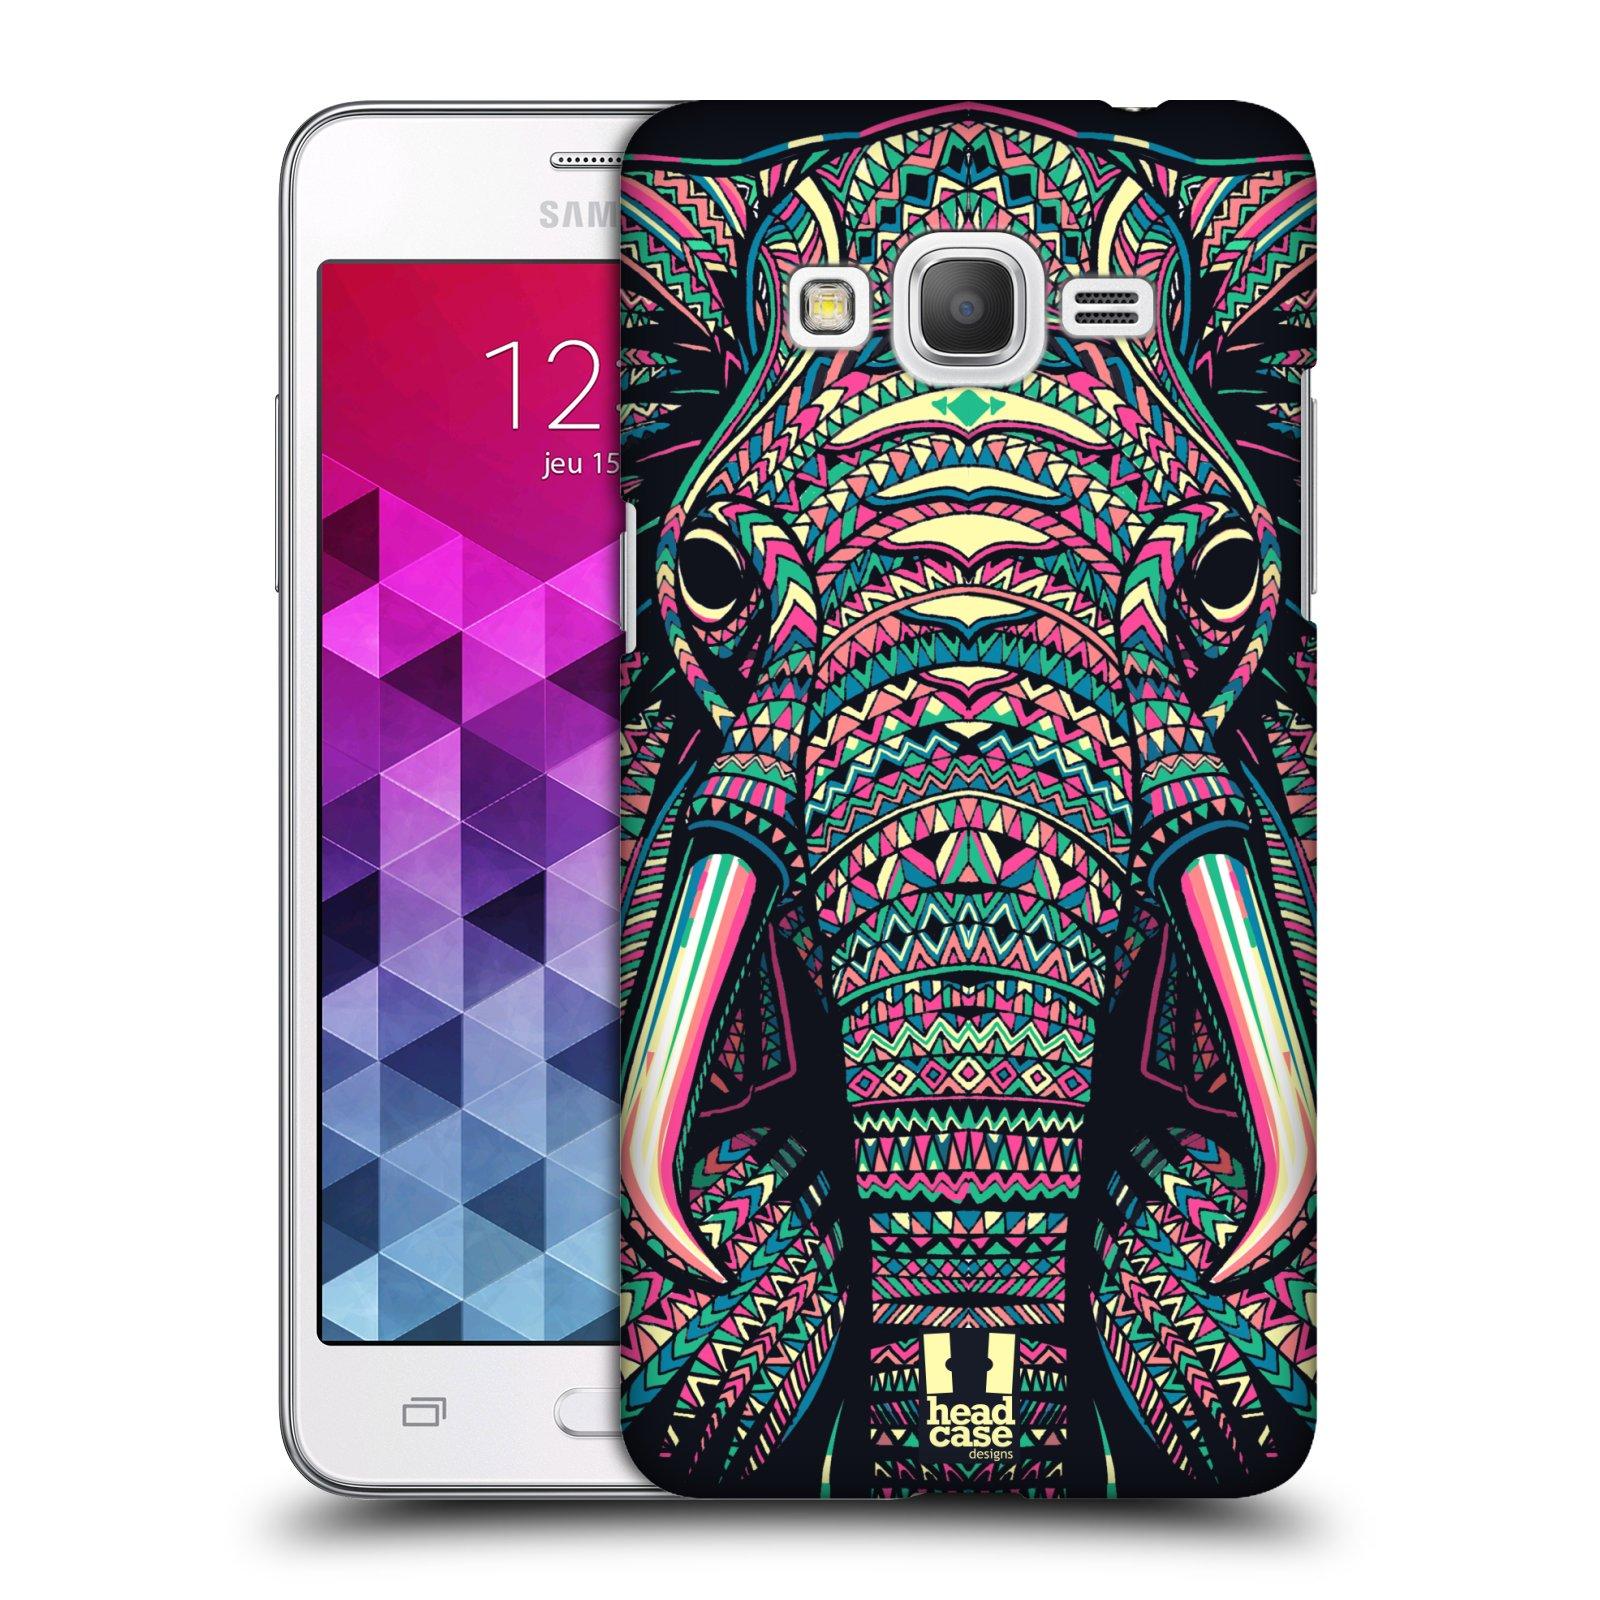 Plastové pouzdro na mobil Samsung Galaxy Grand Prime HEAD CASE AZTEC SLON